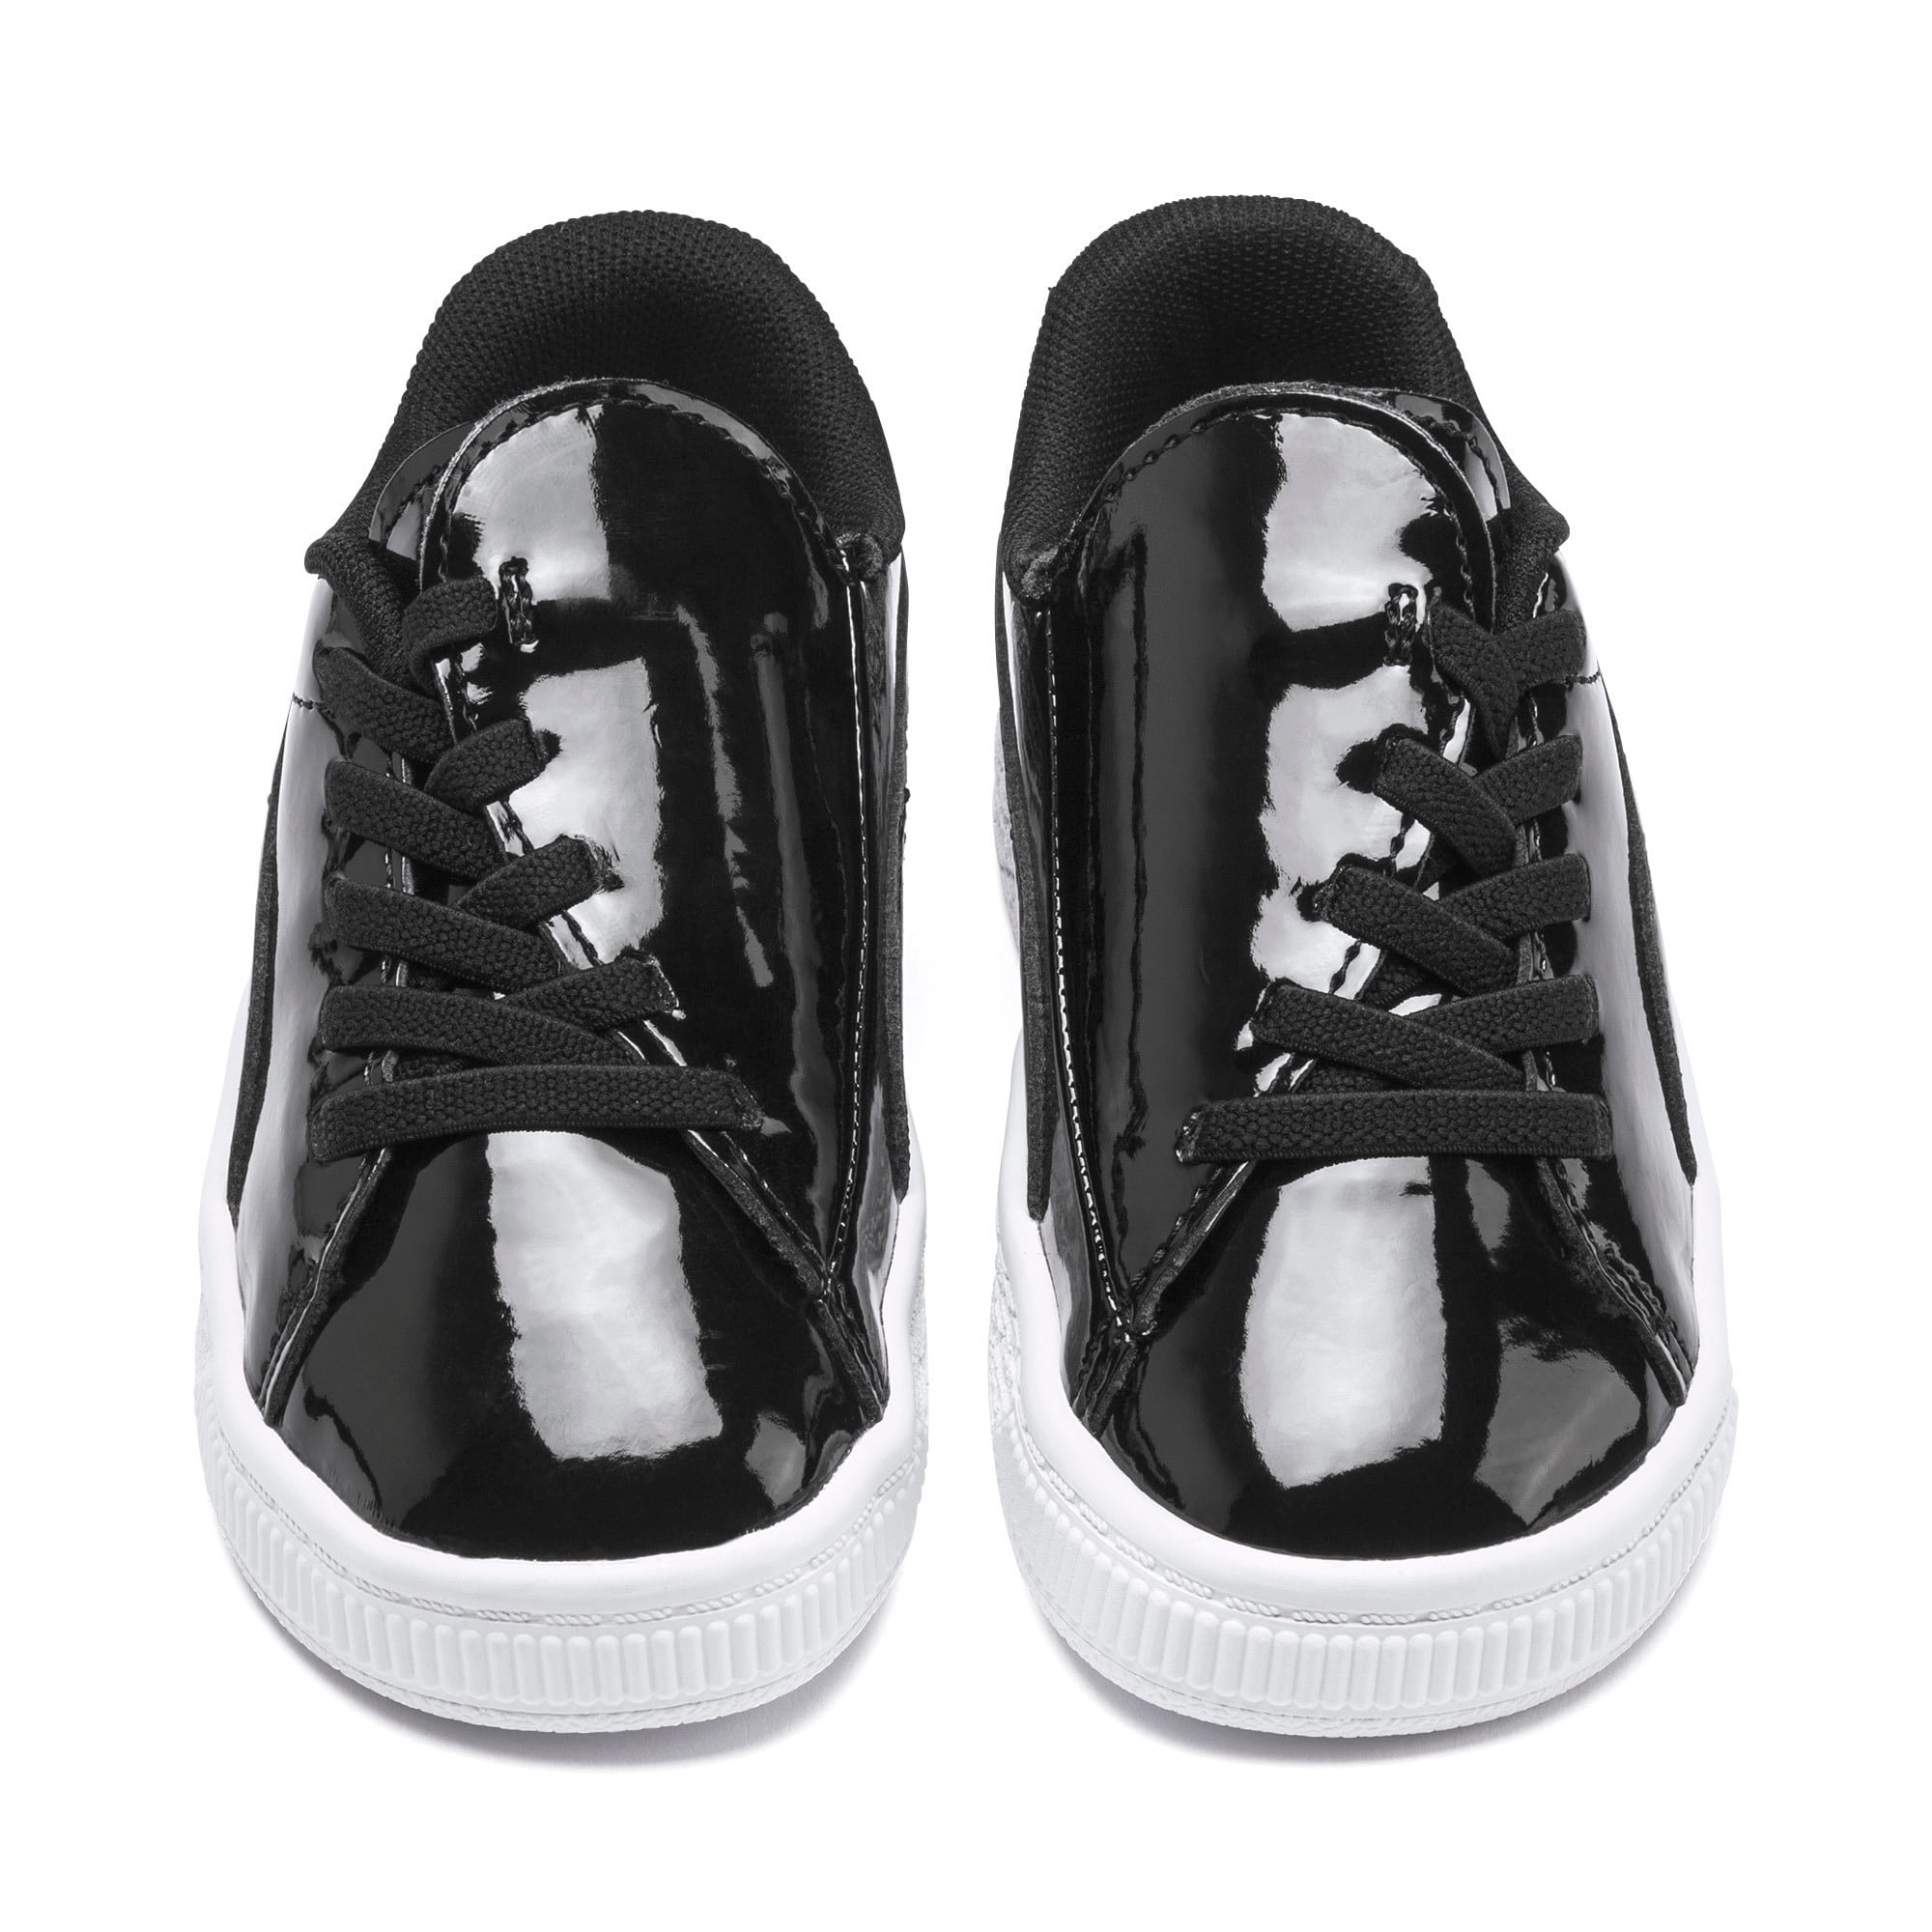 Thumbnail 7 of Basket Crush Patent AC Toddler Shoes, Puma Black-Puma White, medium